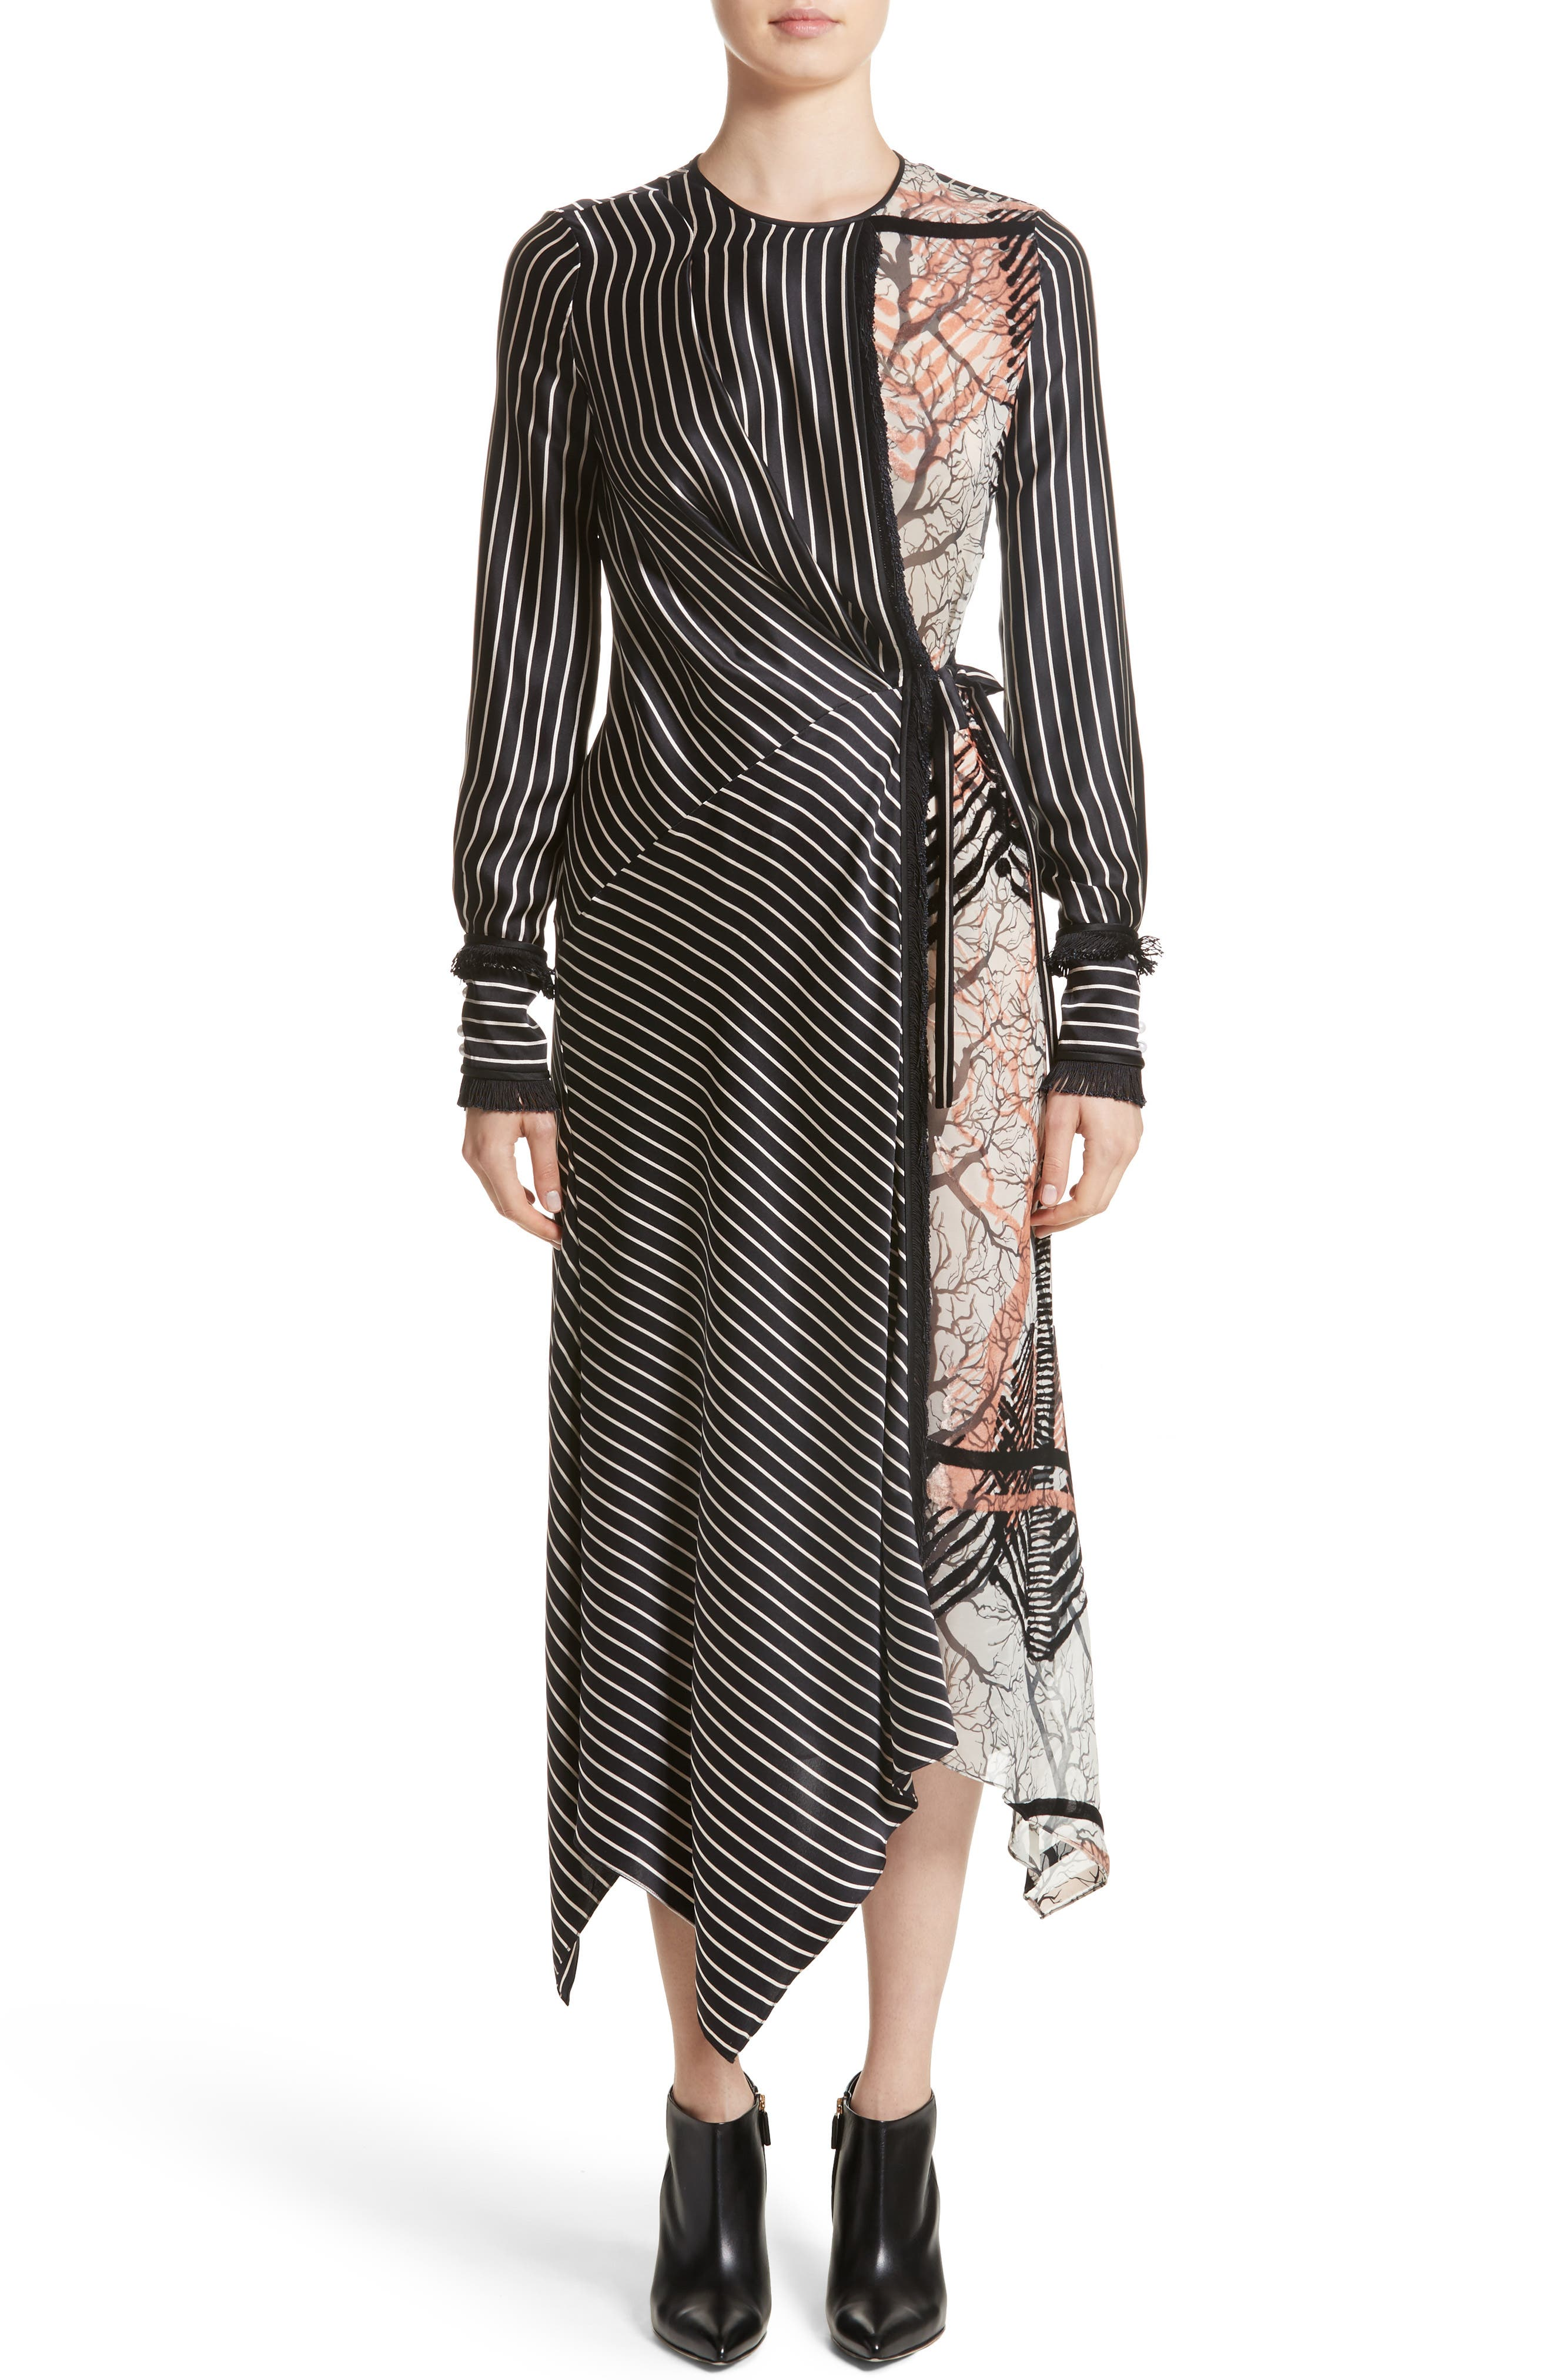 Alternate Image 1 Selected - Yigal Azrouël Fringe Trim Asymmetrical Stripe Silk Dress